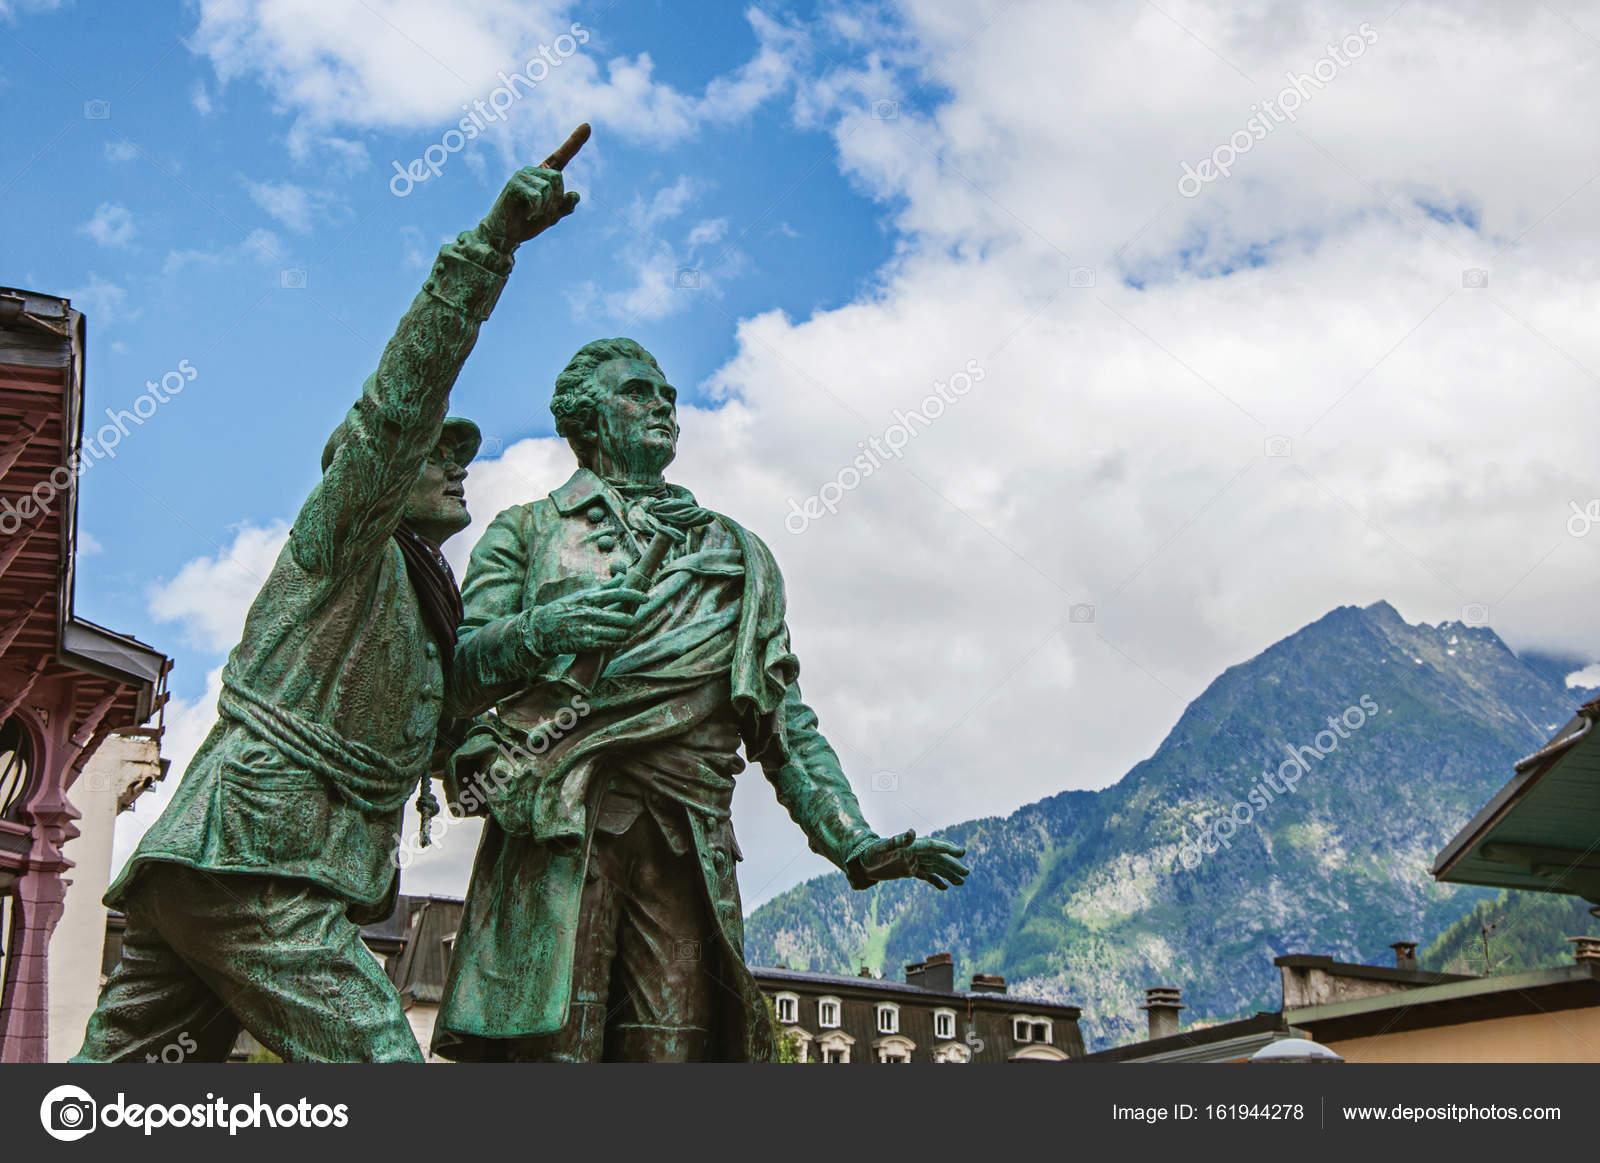 https://st3.depositphotos.com/13319972/16194/i/1600/depositphotos_161944278-stock-photo-statue-in-honor-of-balmat.jpg